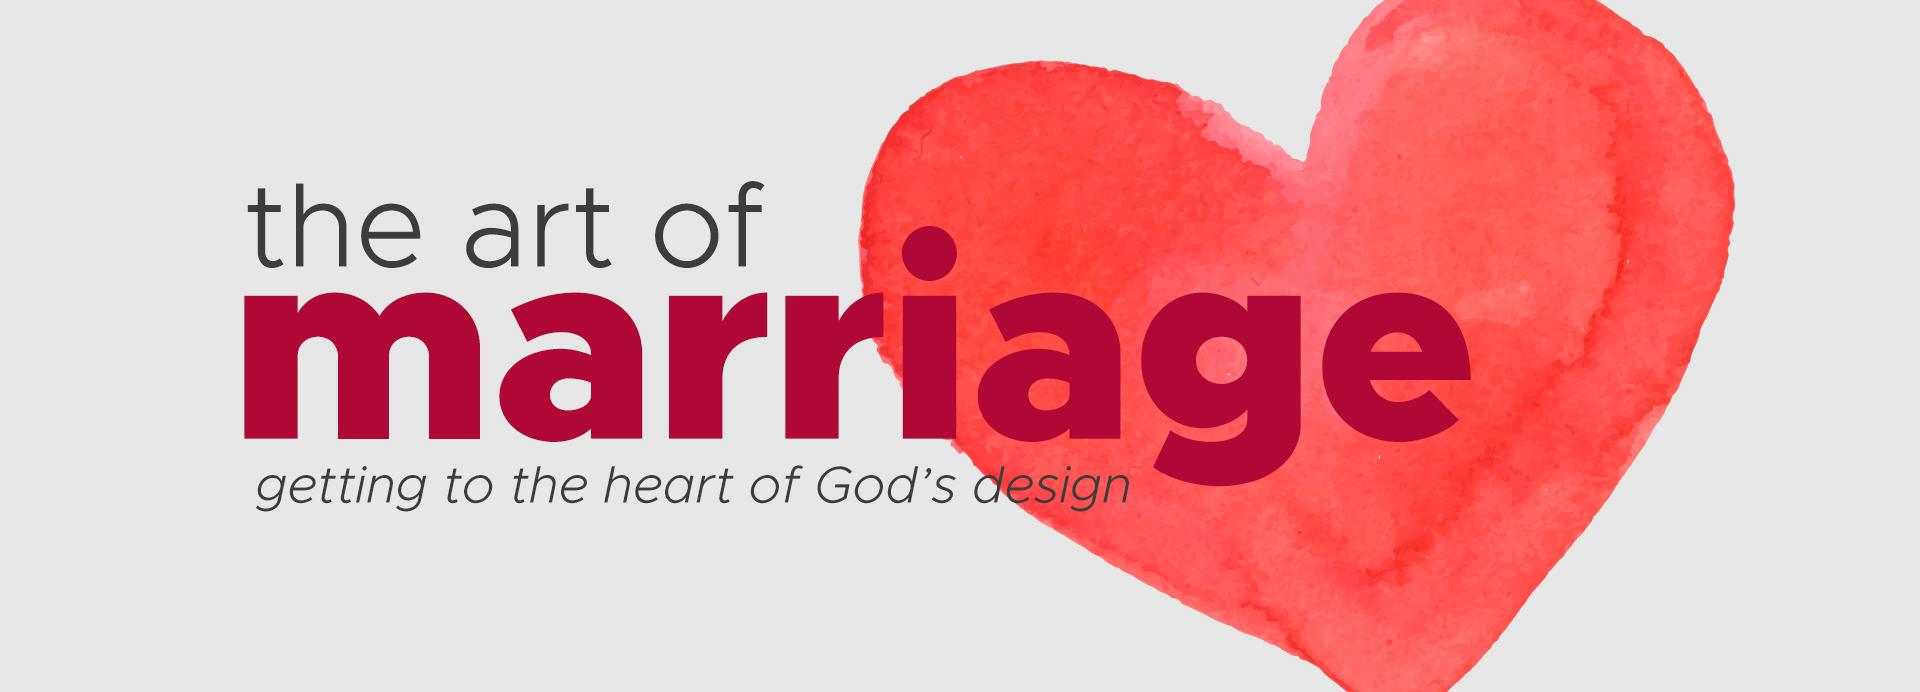 Art of marriage_banner.jpg